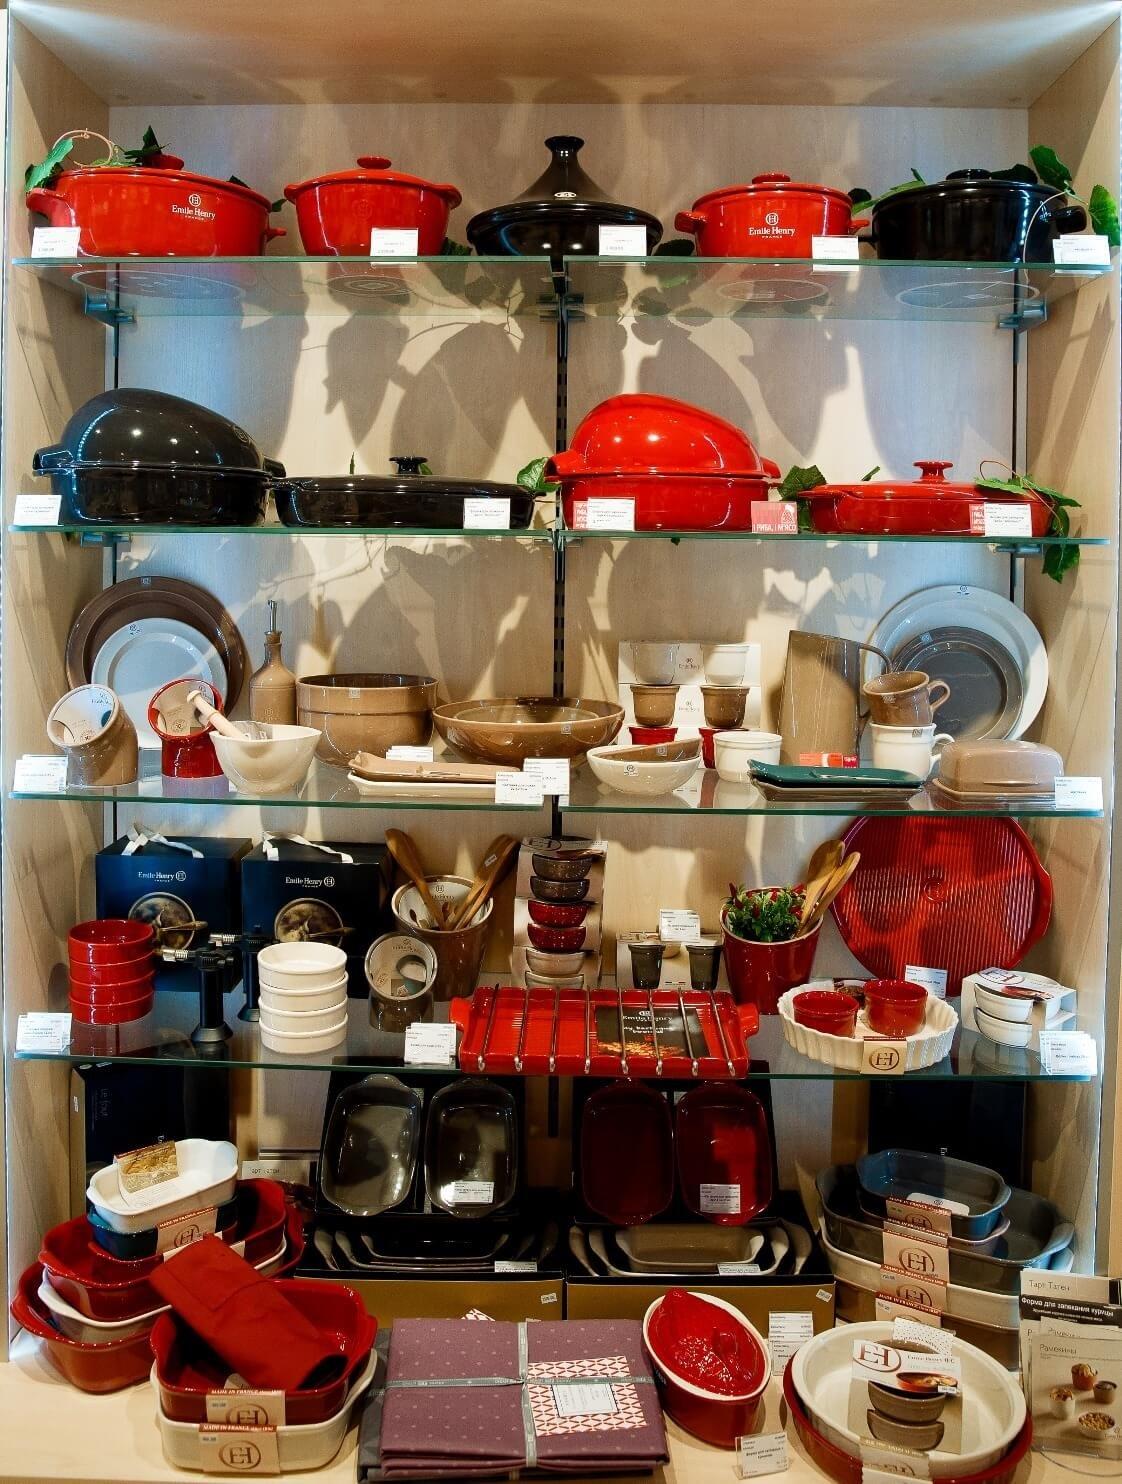 Набор форм для крем-брюле Emile Henry, 13 см, красный, 2 штуки Emile Henry 344013 фото 3